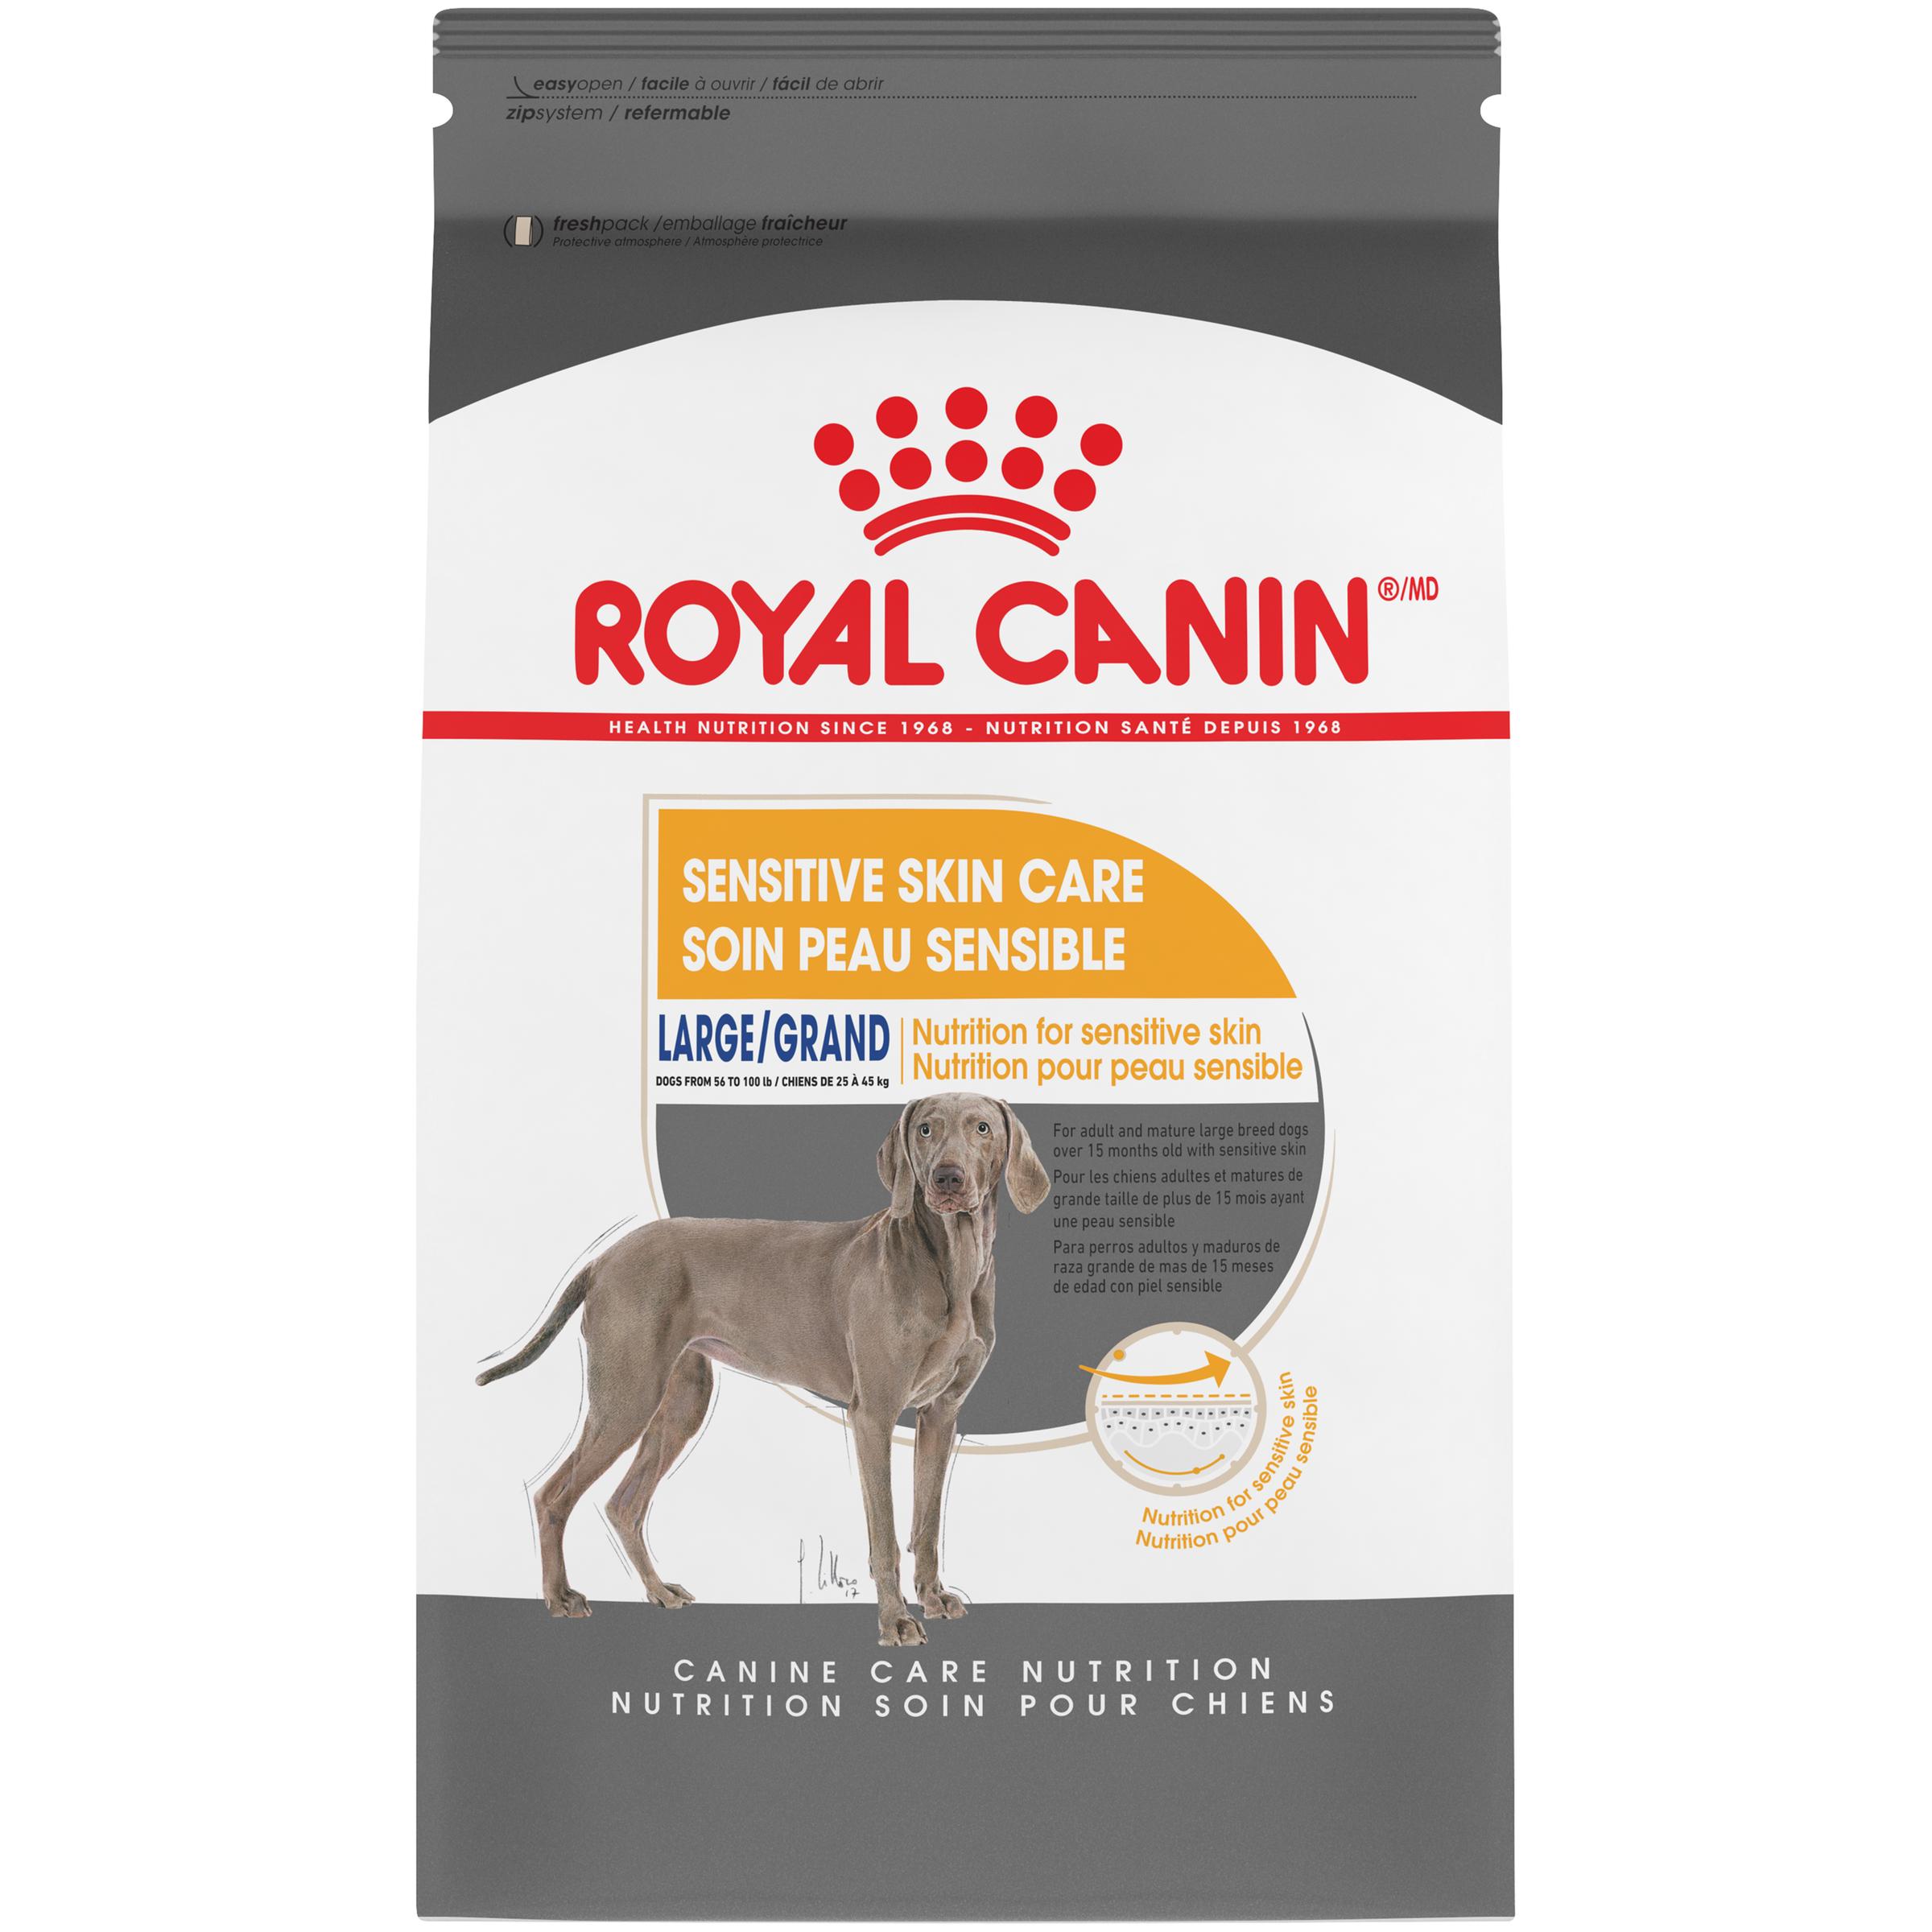 Royal Canin Canine Care Nutrition Large Sensitive Skin Care Dry Dog Food Image